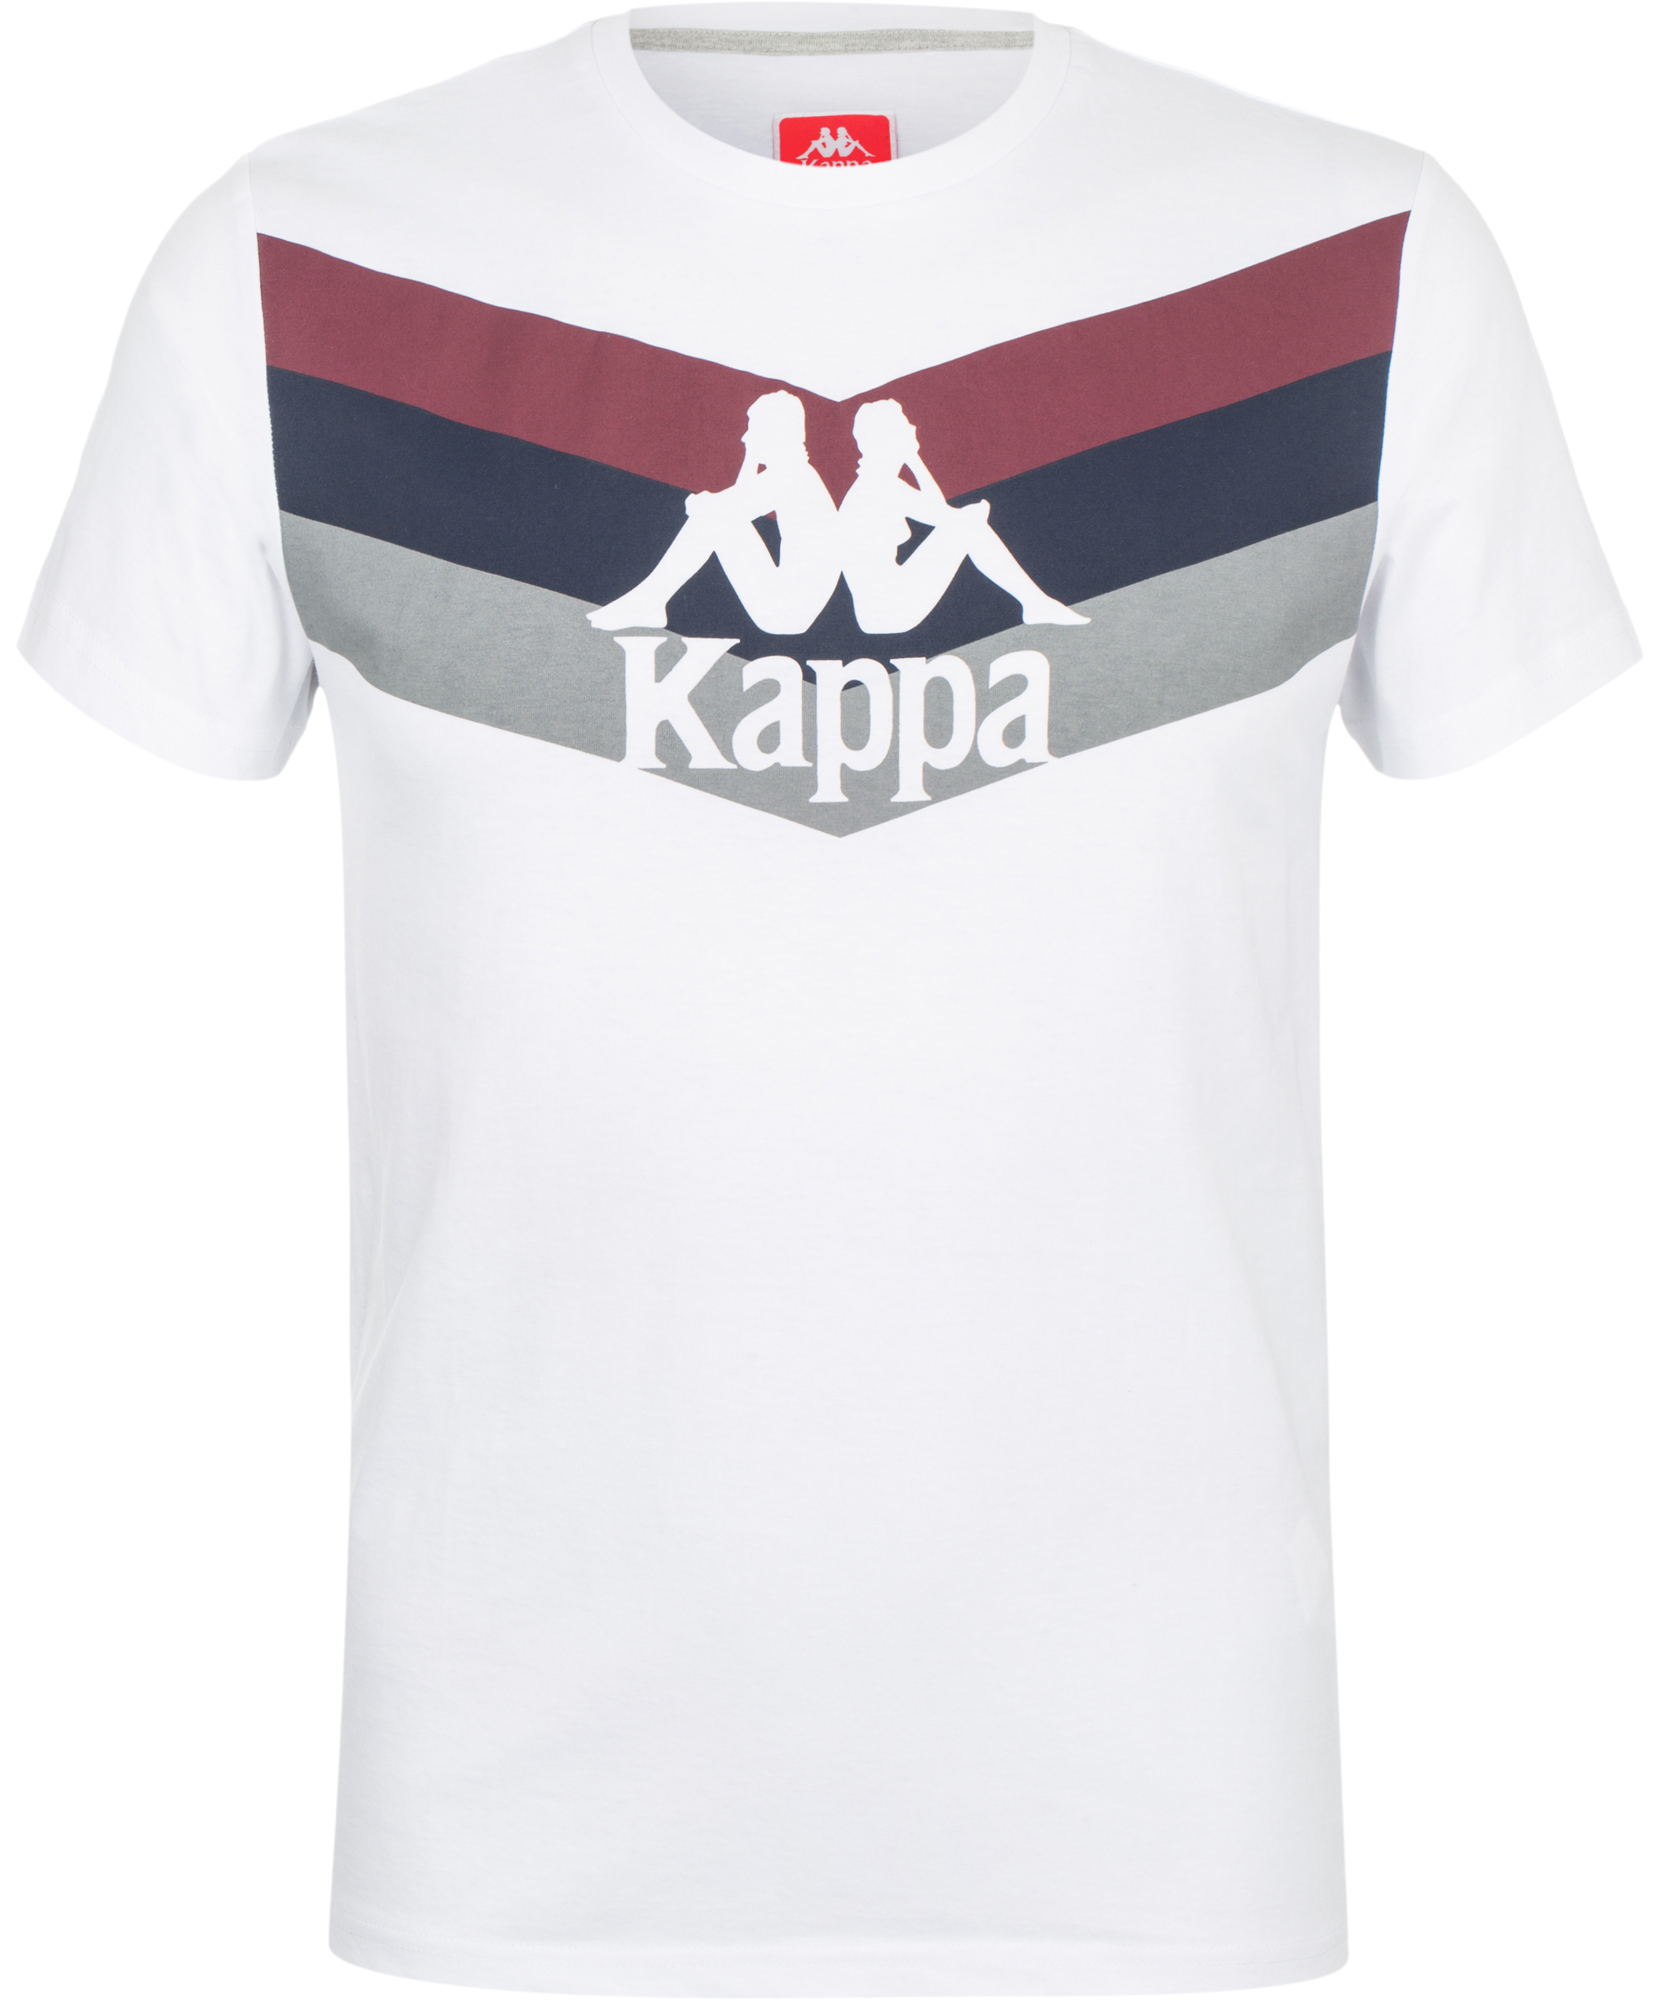 Kappa Футболка мужская Kappa